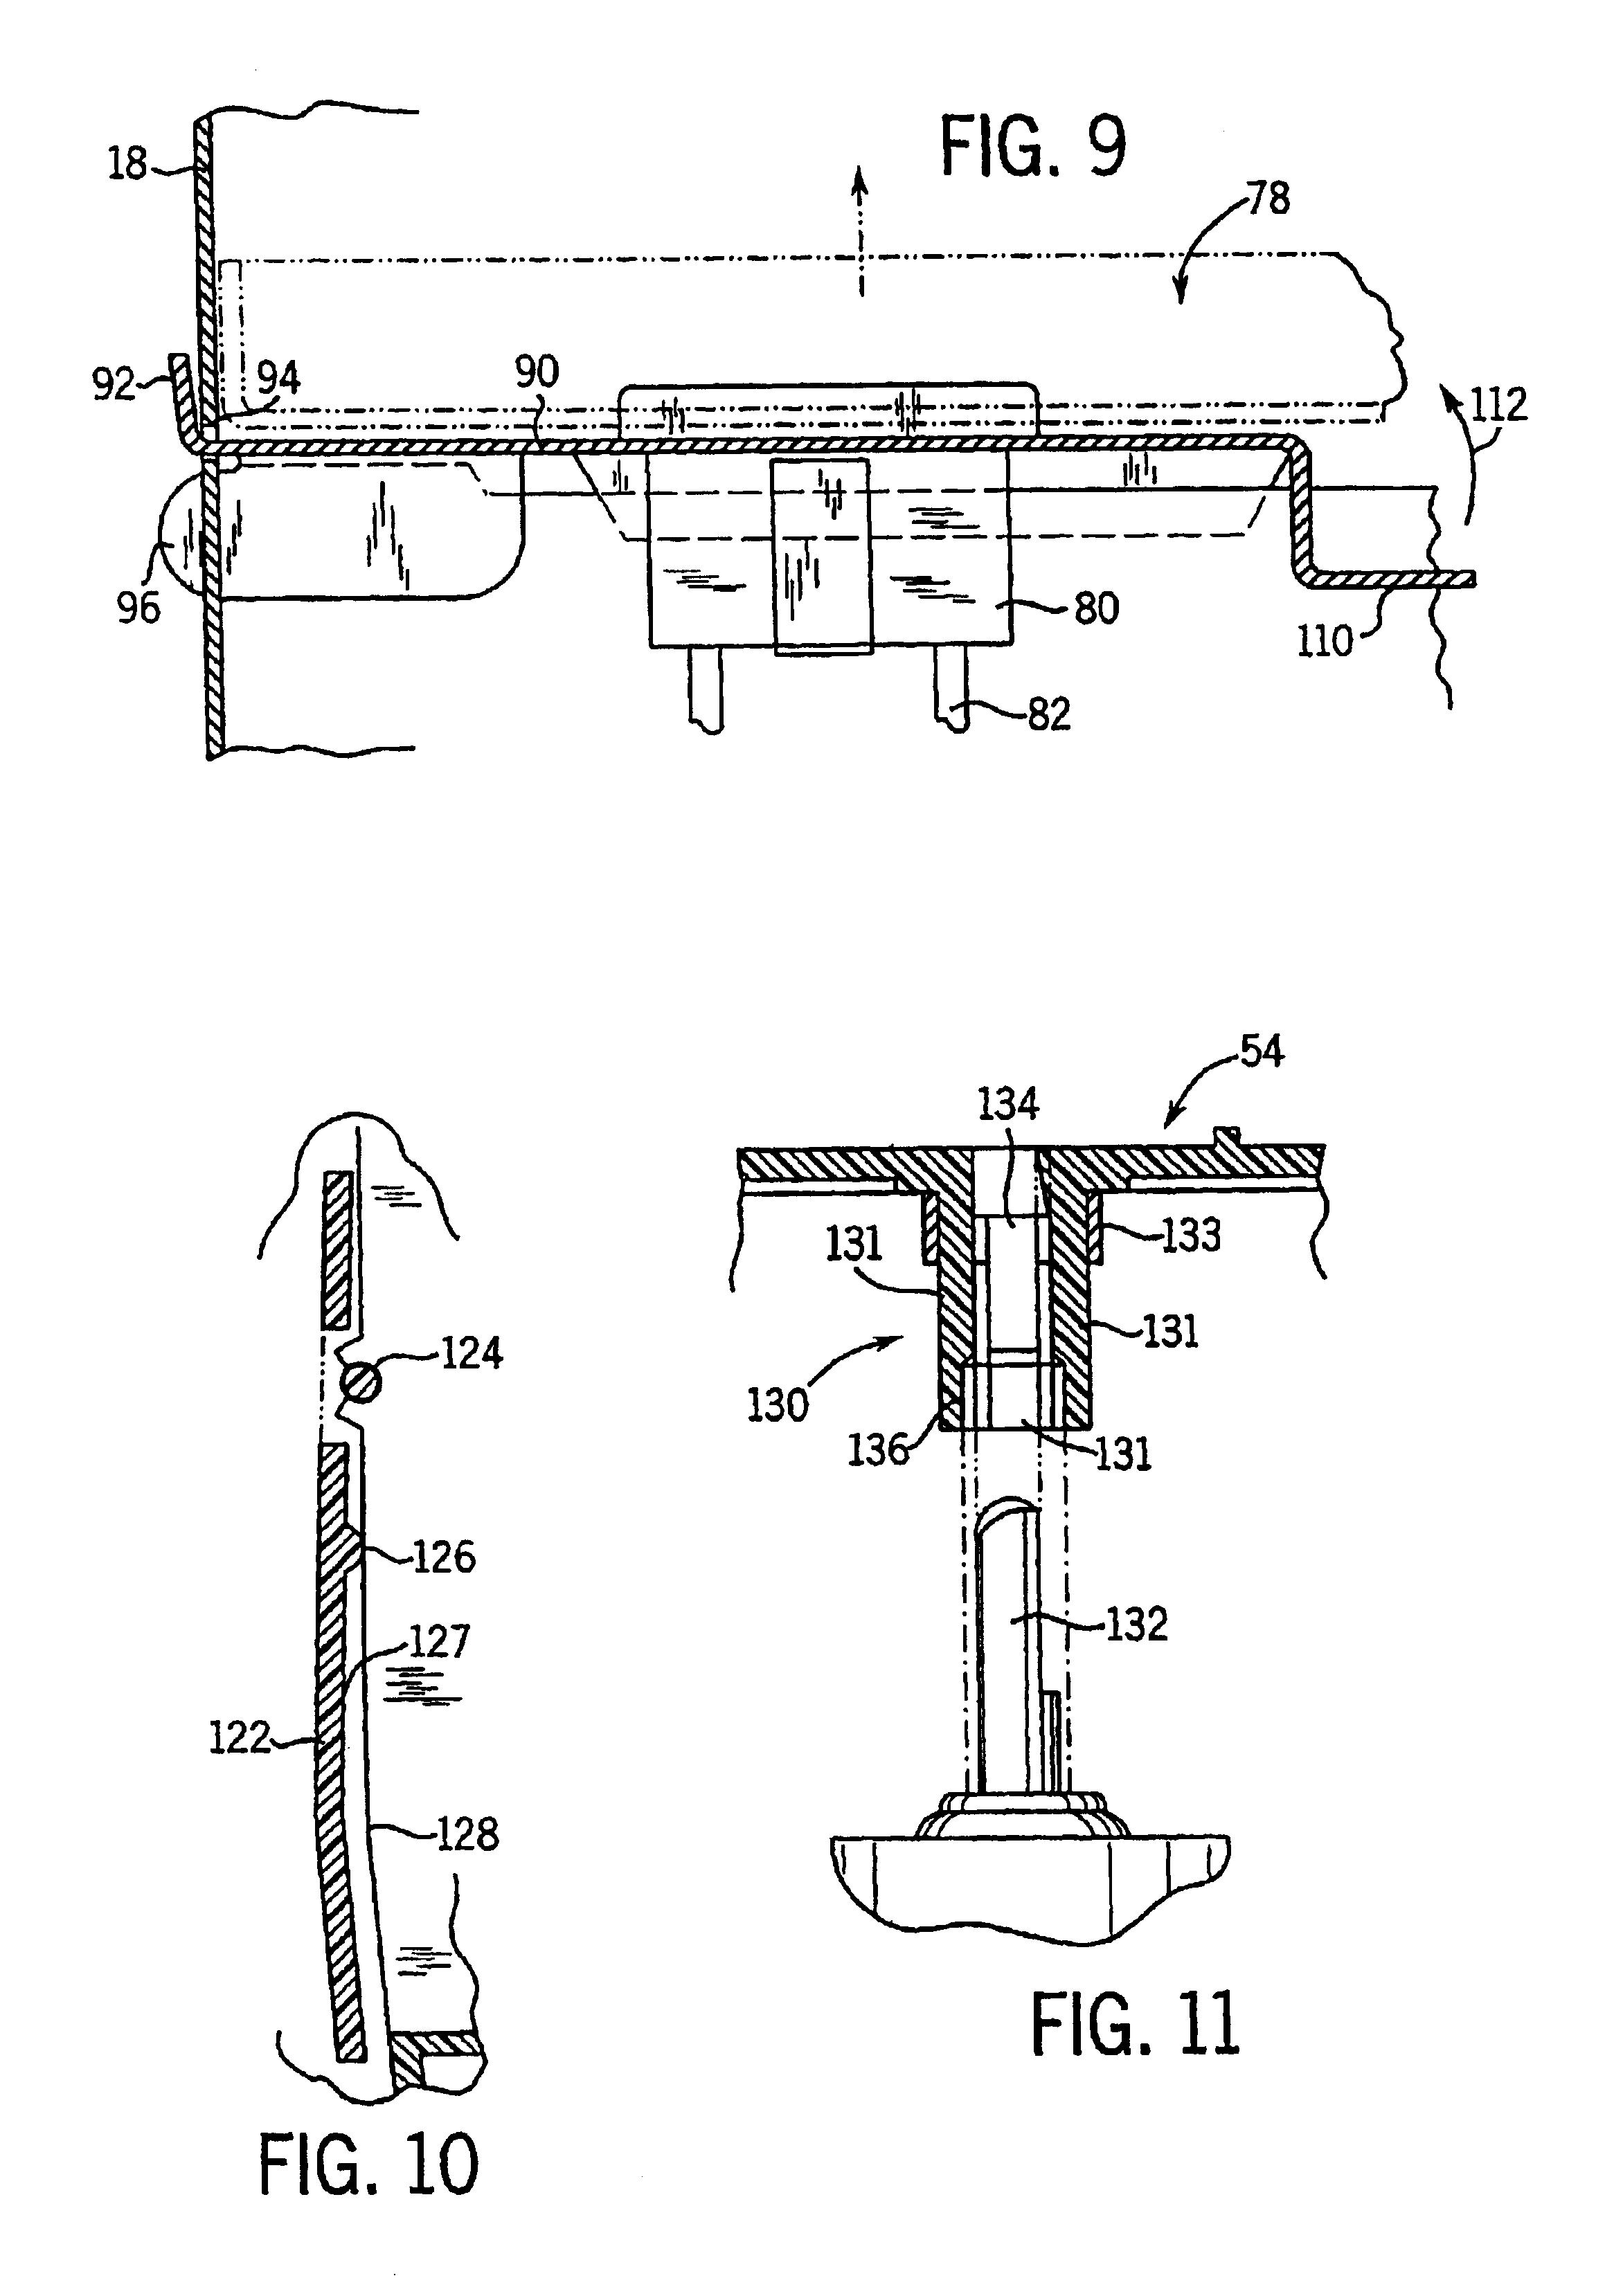 Emerson pryne bathroom exhaust fan - Patent Drawing